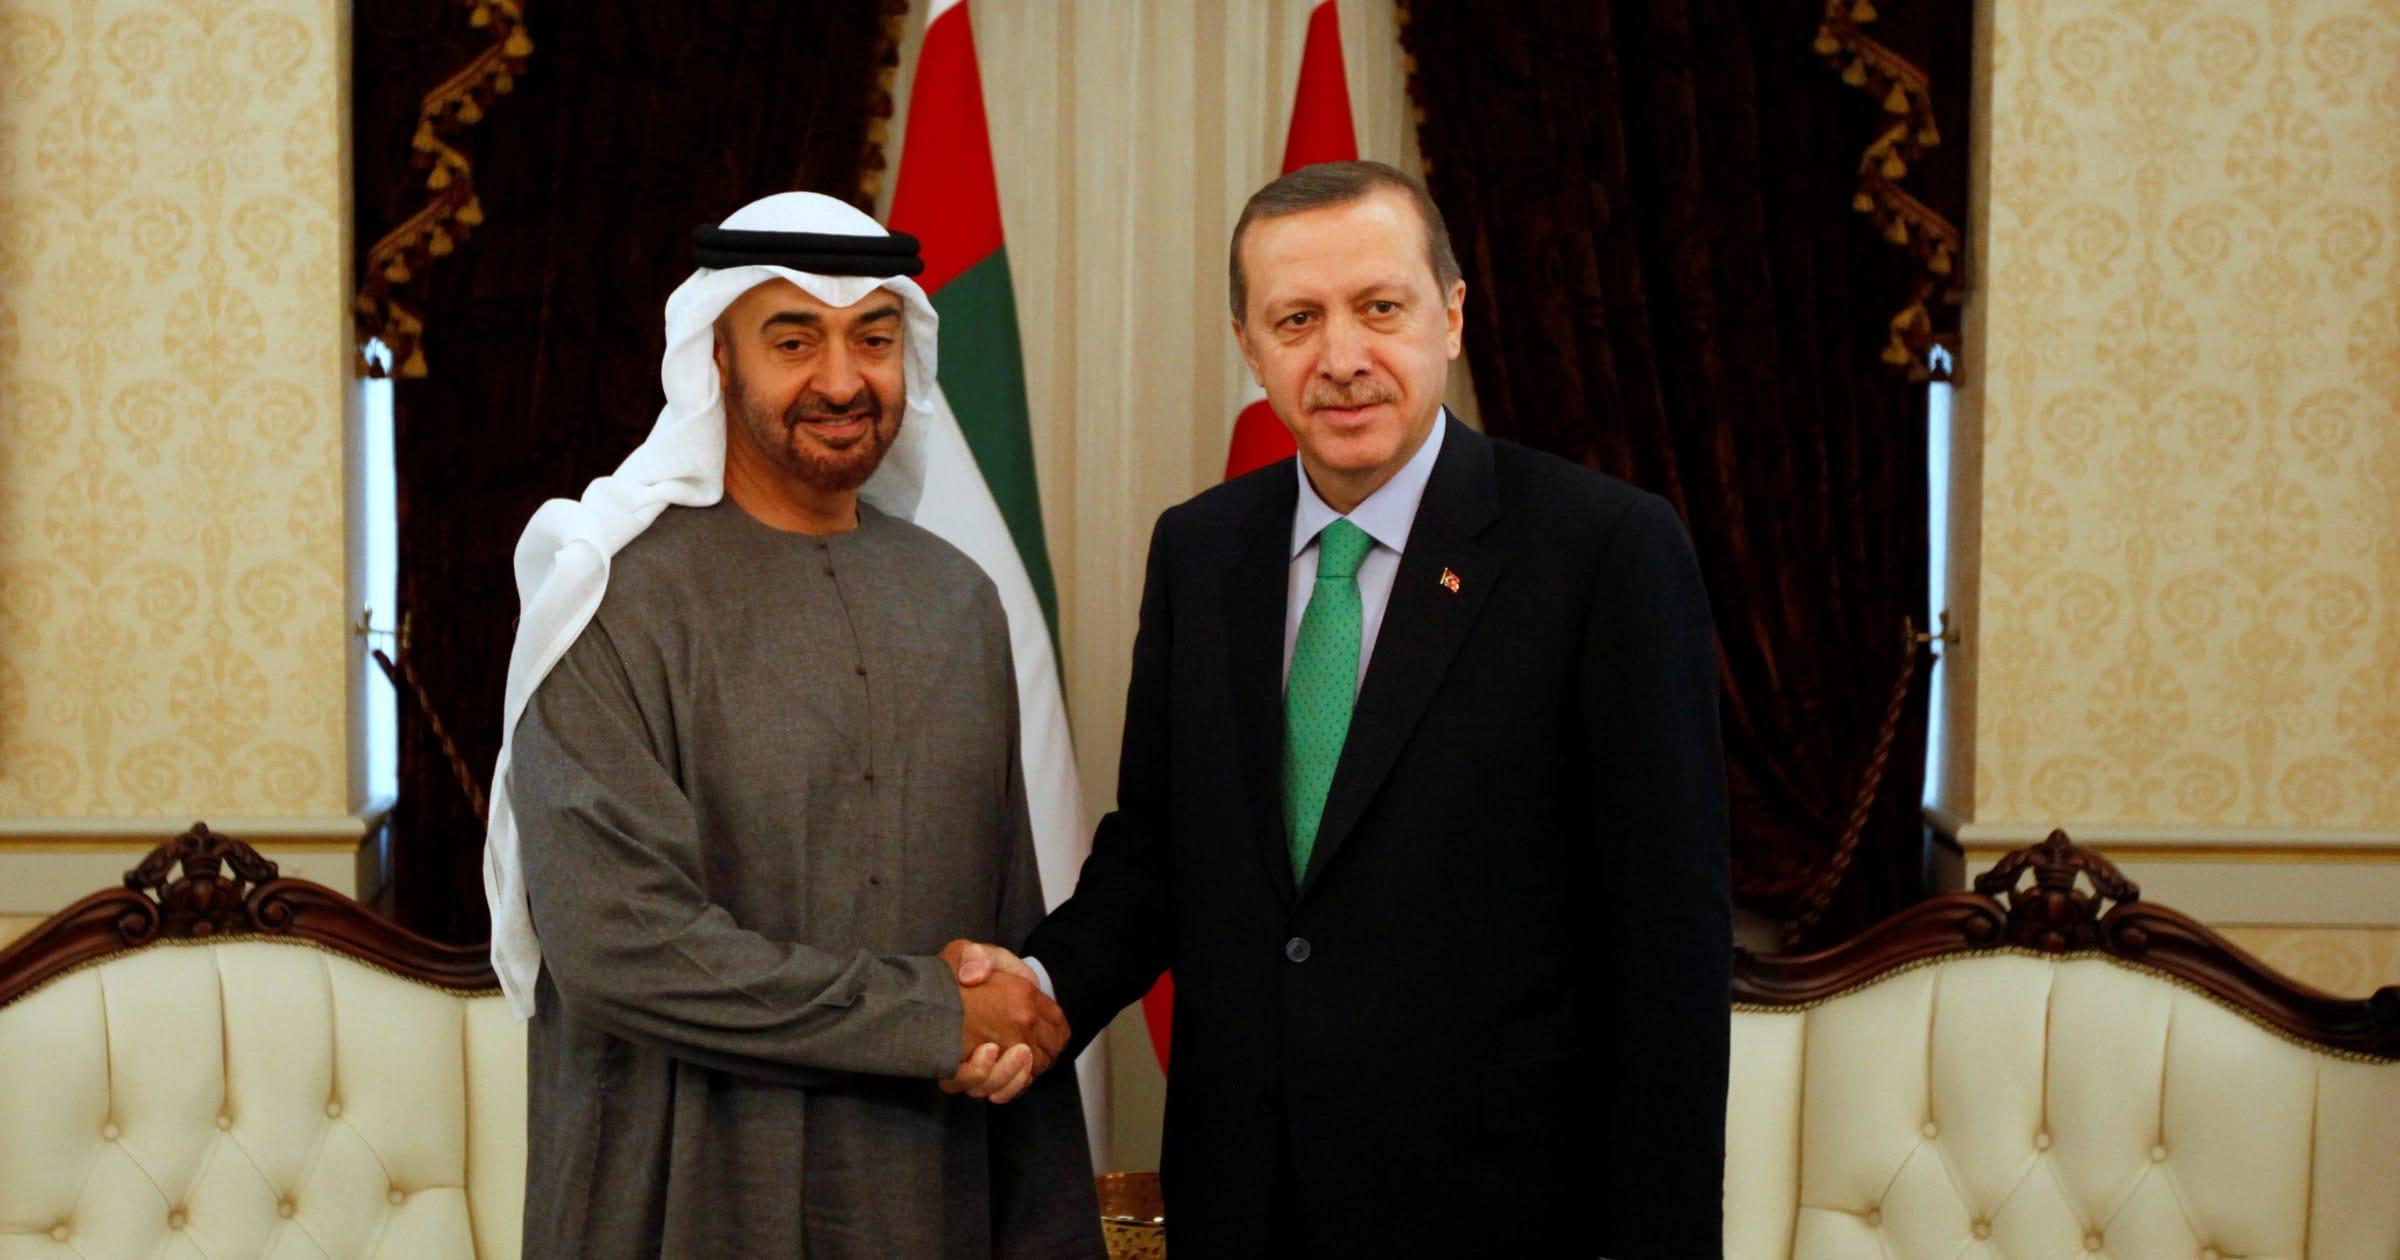 رجب طيب أردوغان ومحمد بن زايد